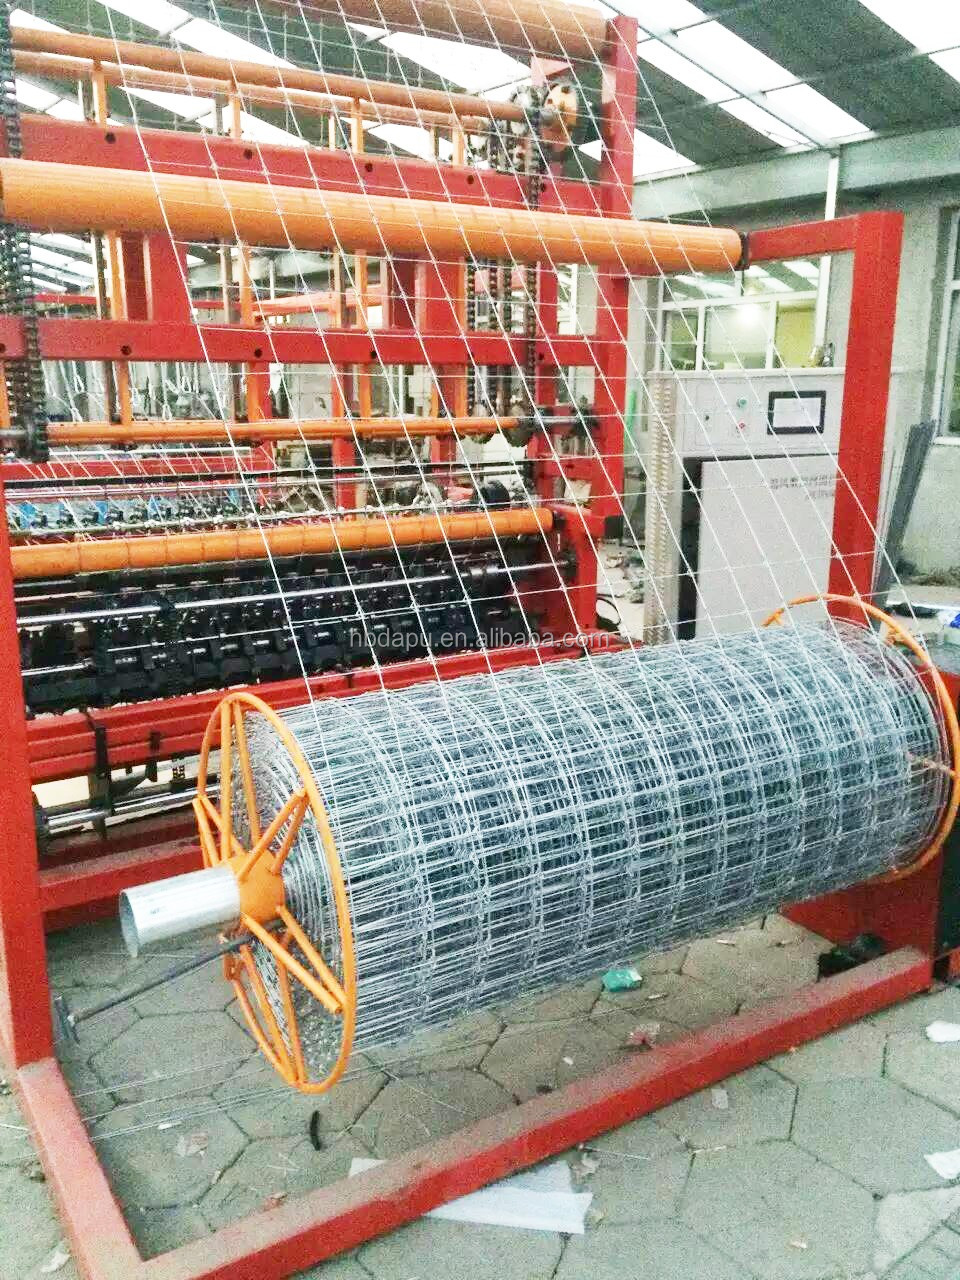 Korrosionsschutz Fix Knoten Grünland Zaun Maschine - Buy Product on ...